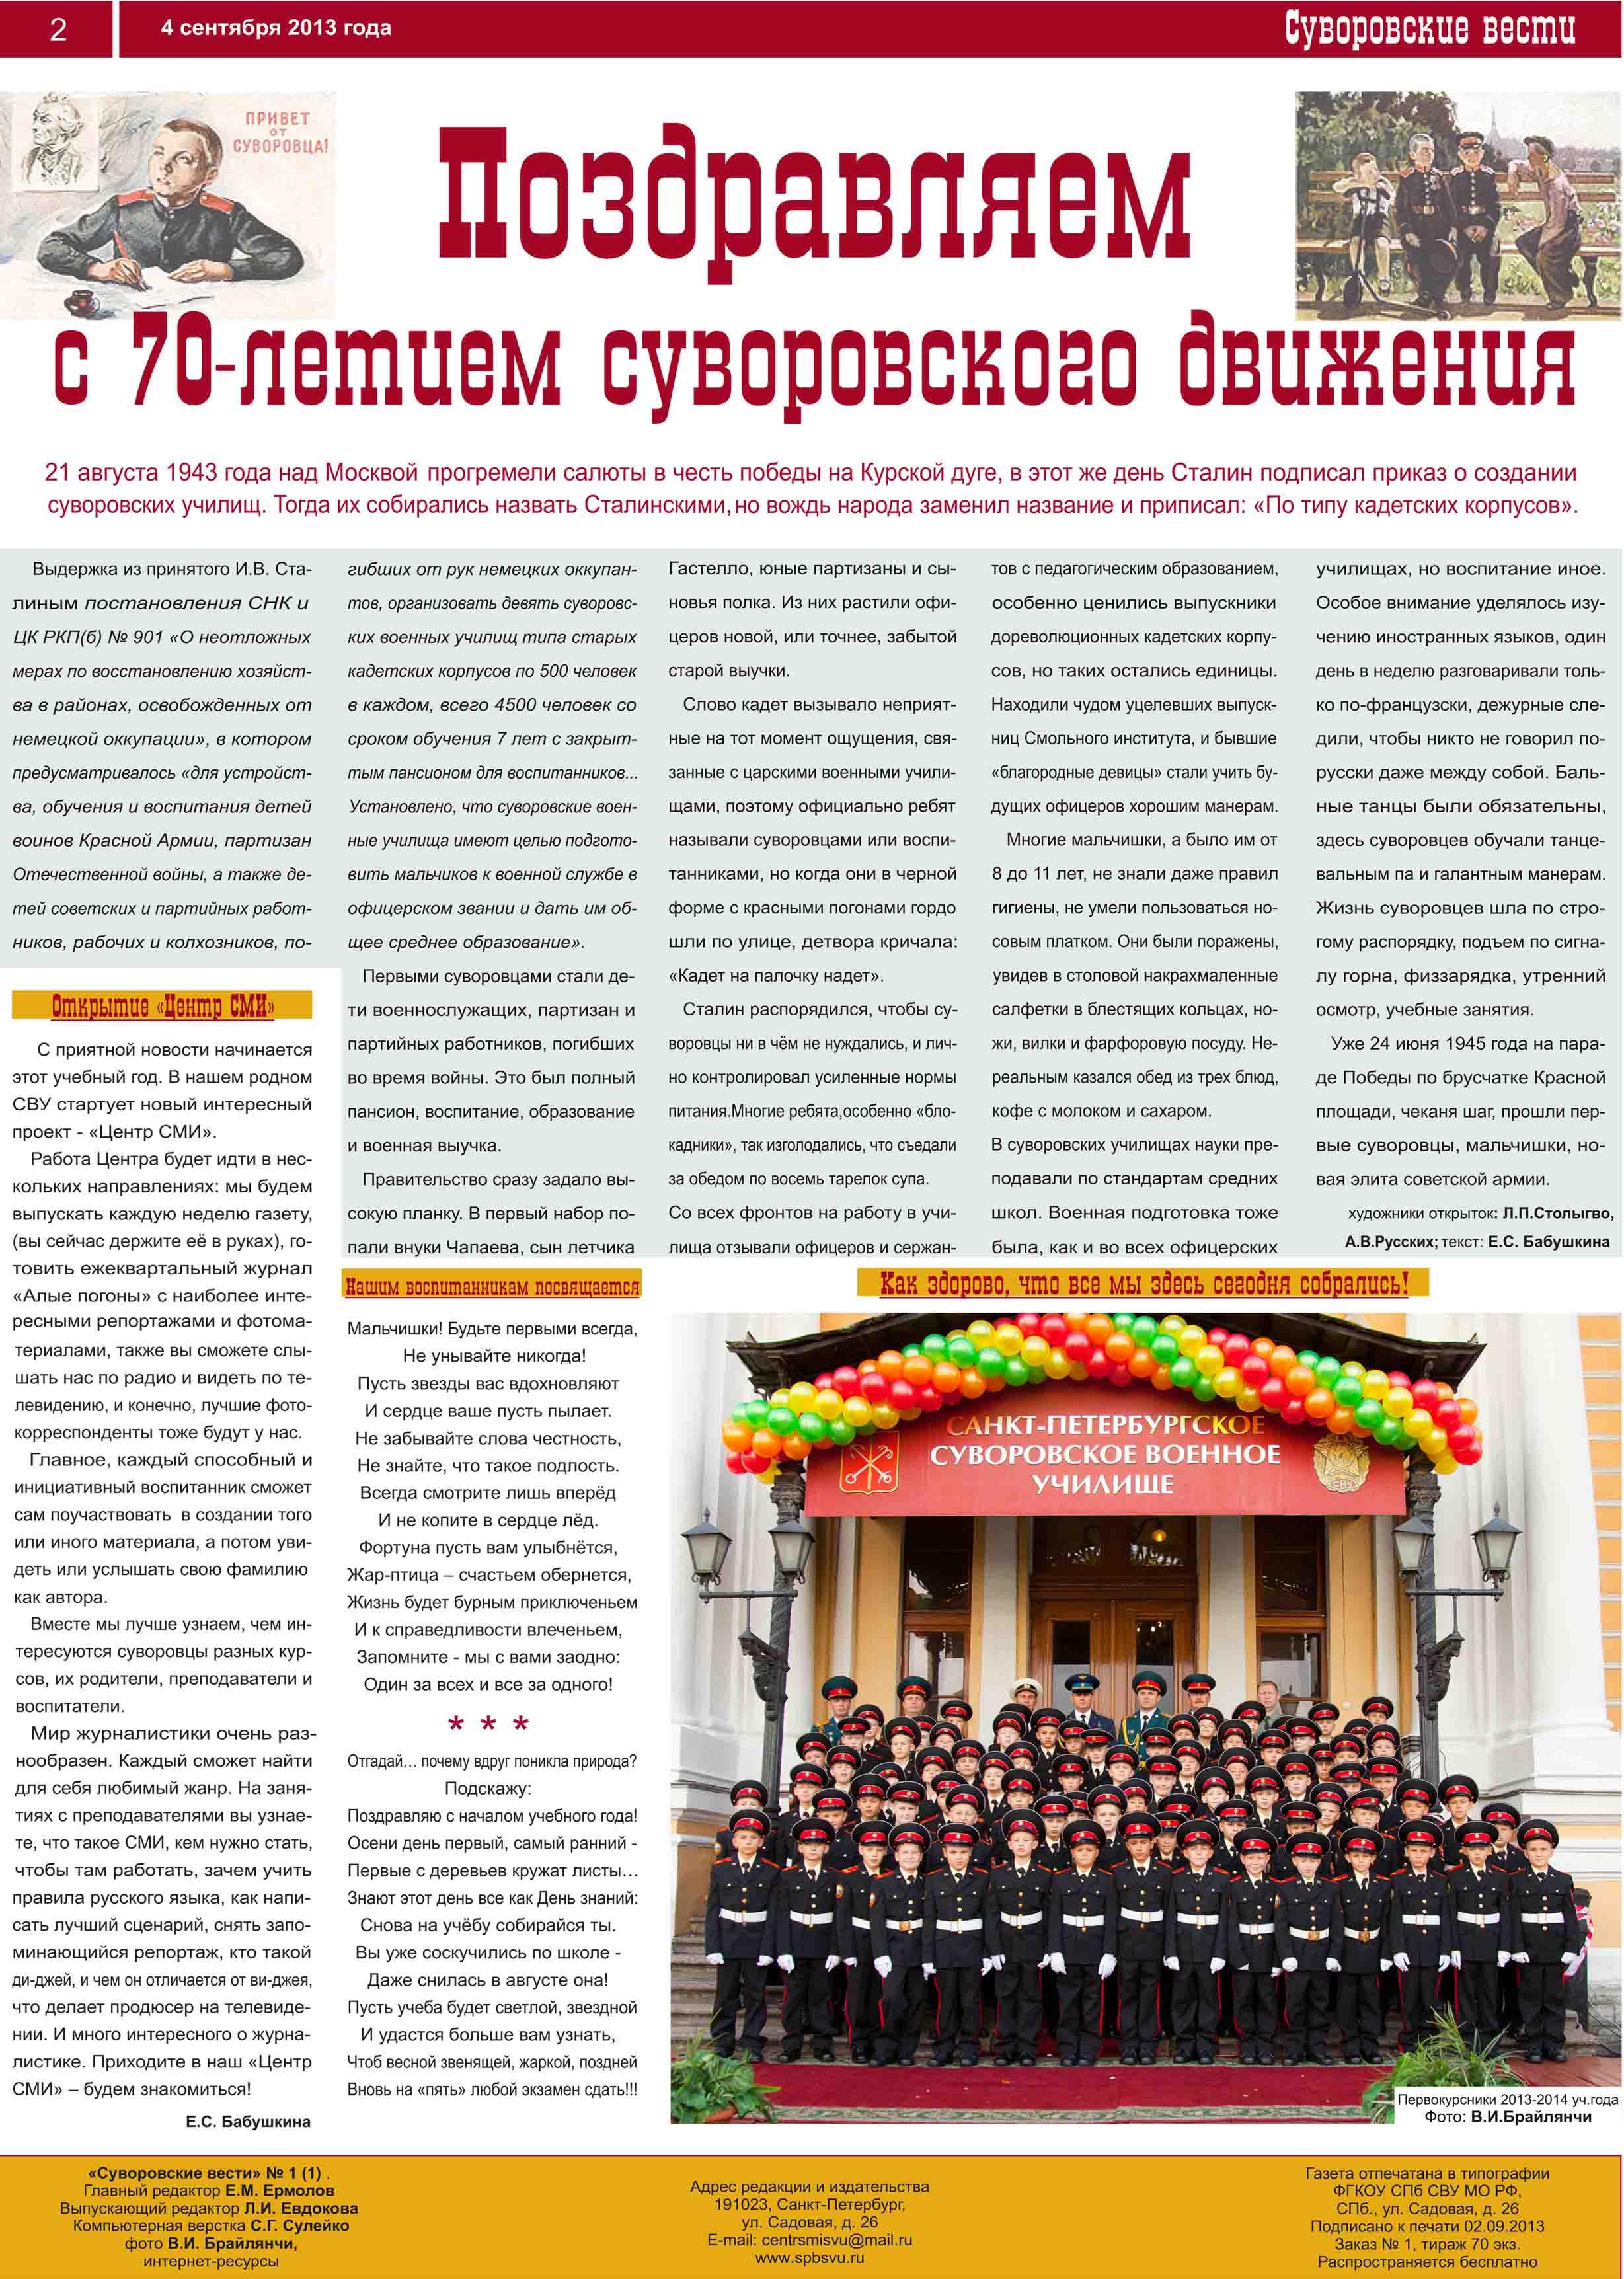 newsPaper_01.cdr